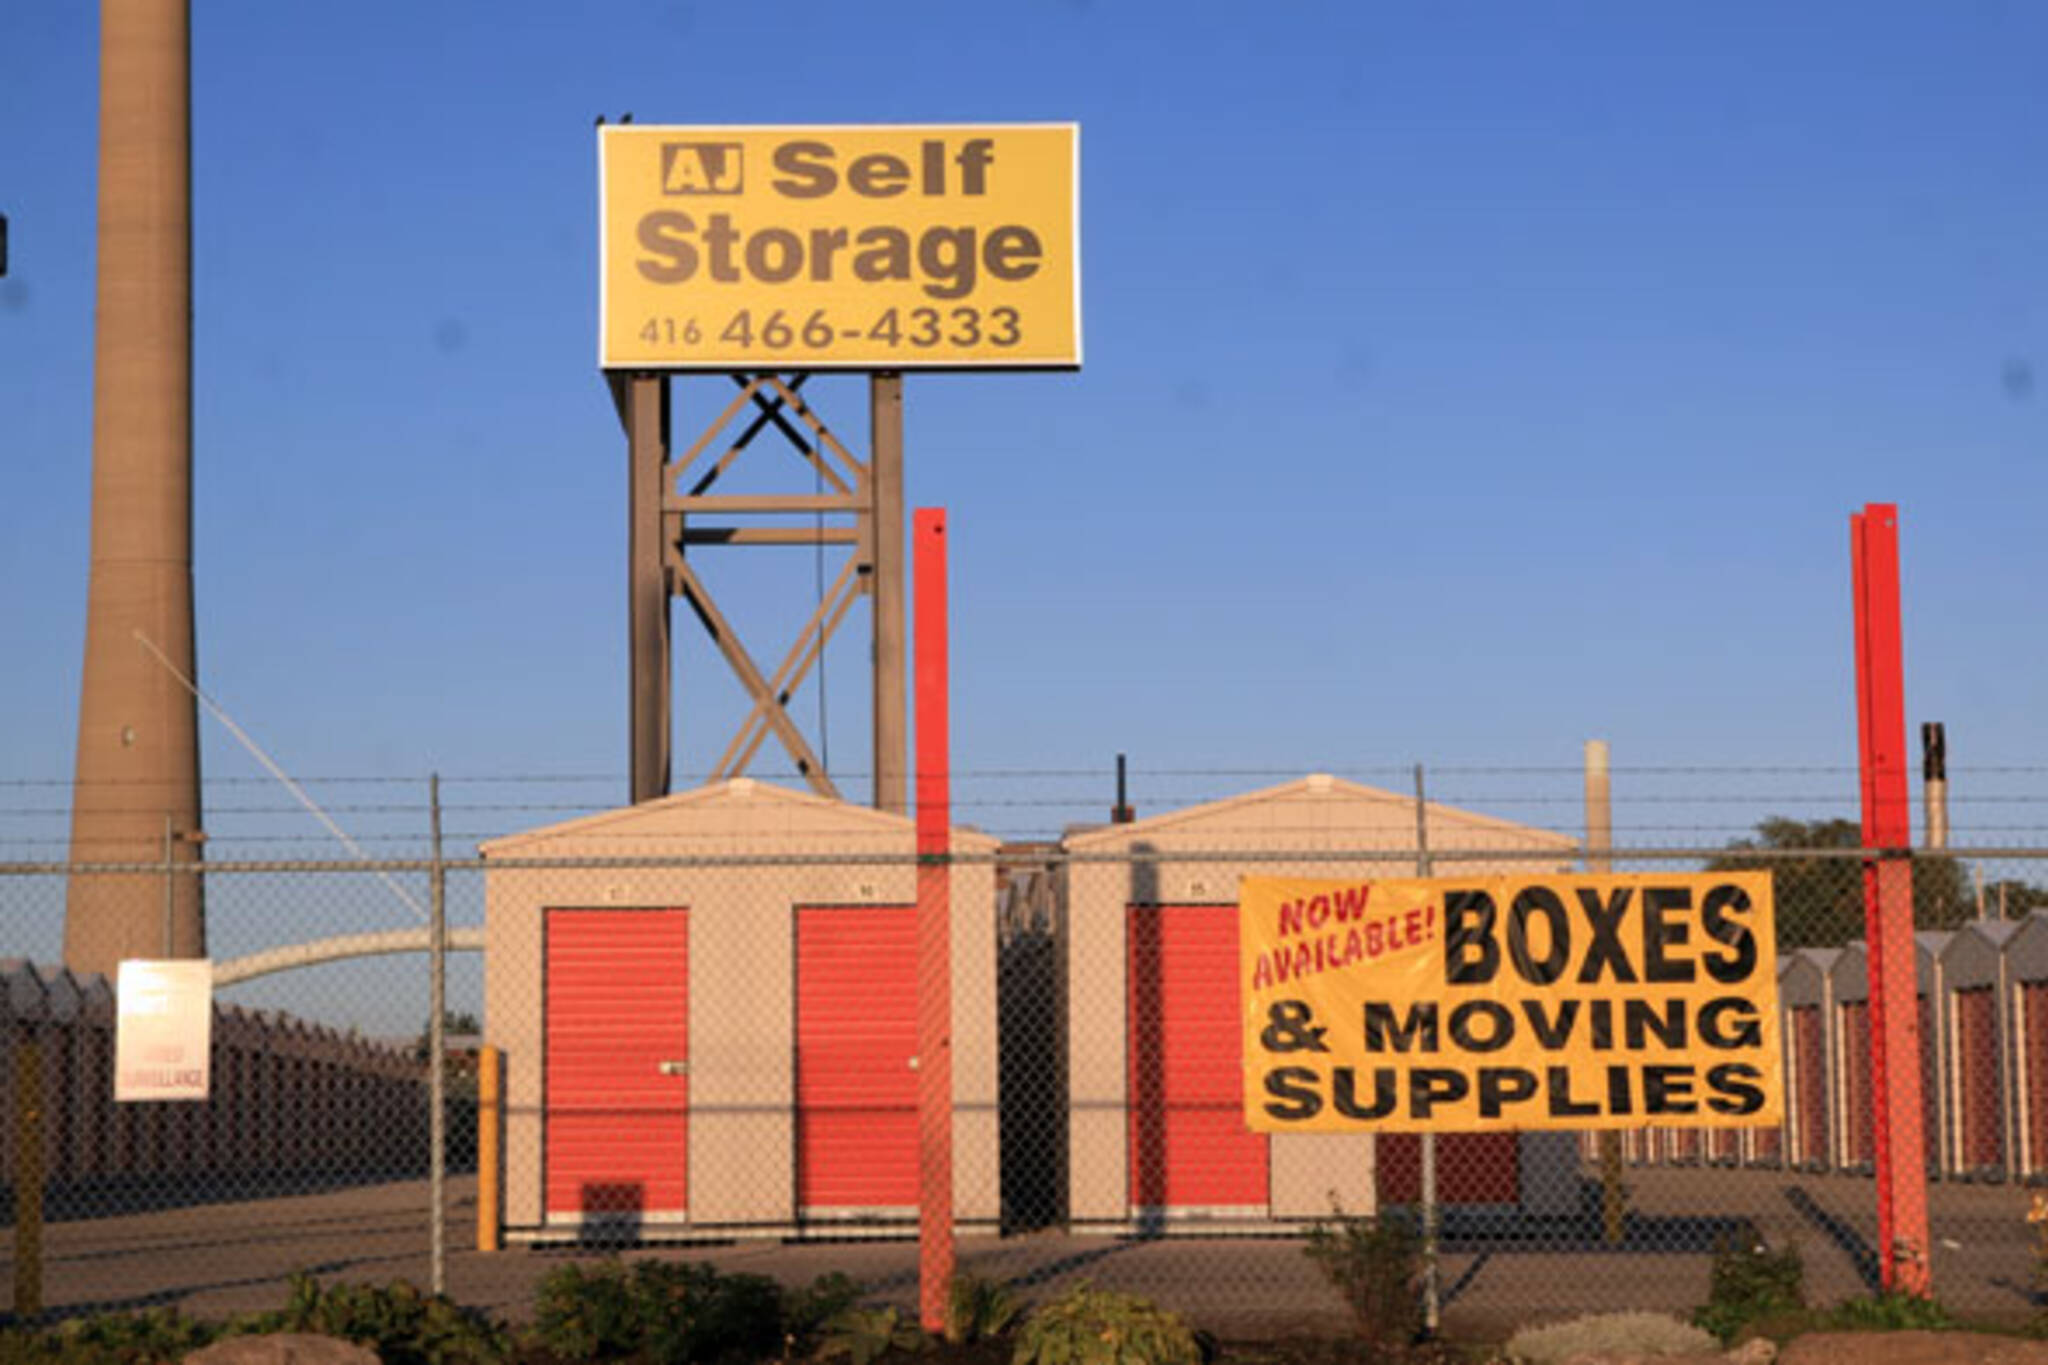 AJ Self Storage